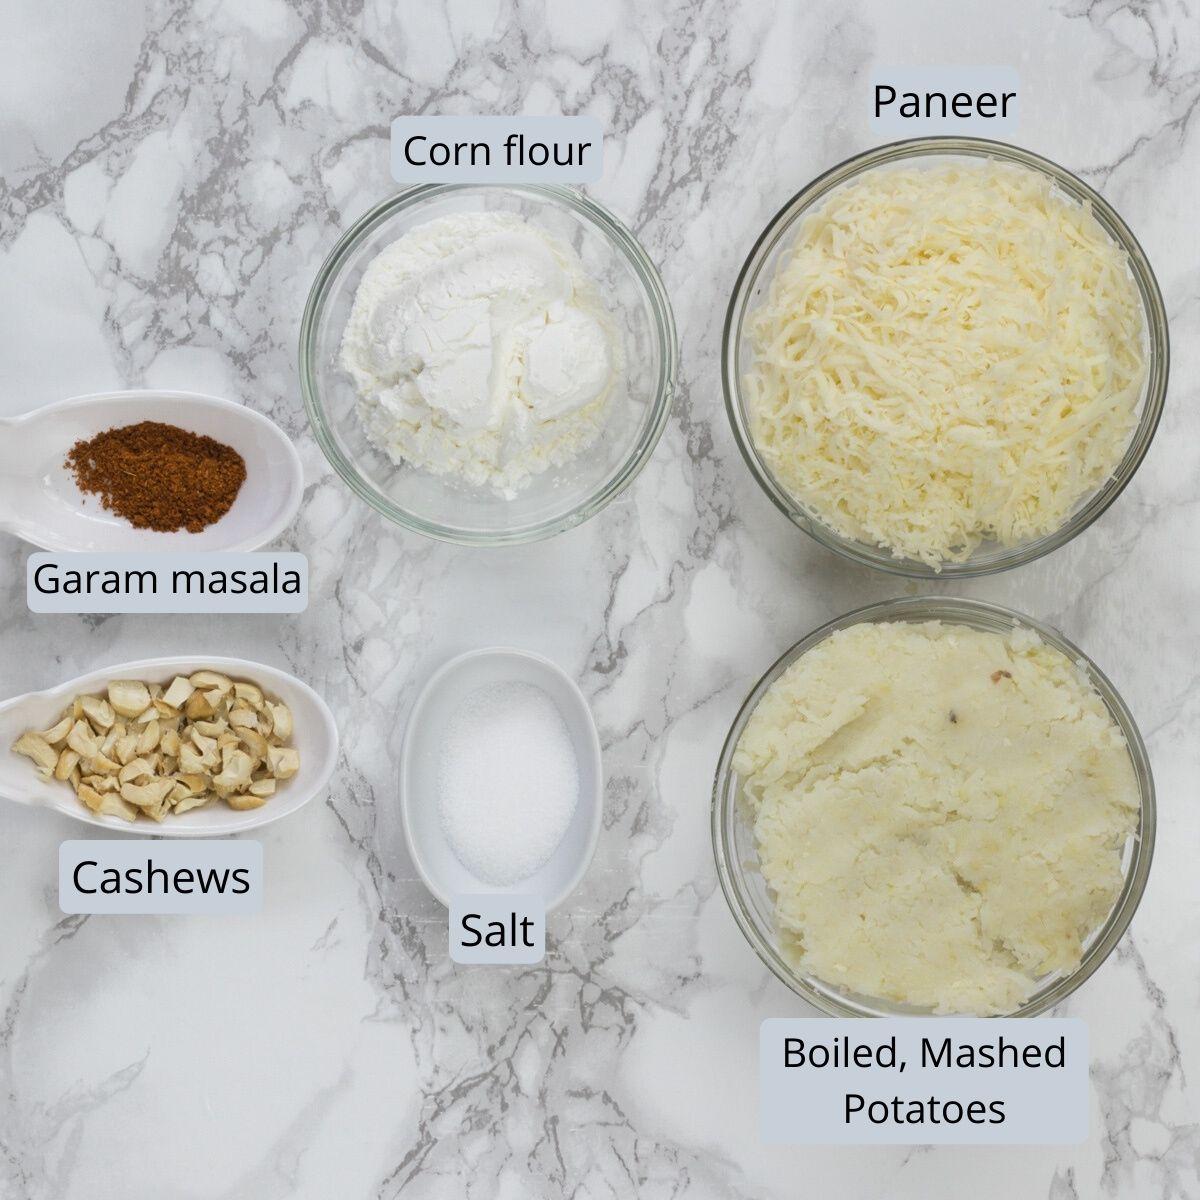 Kofta ingredients in individual bowls and spoons.